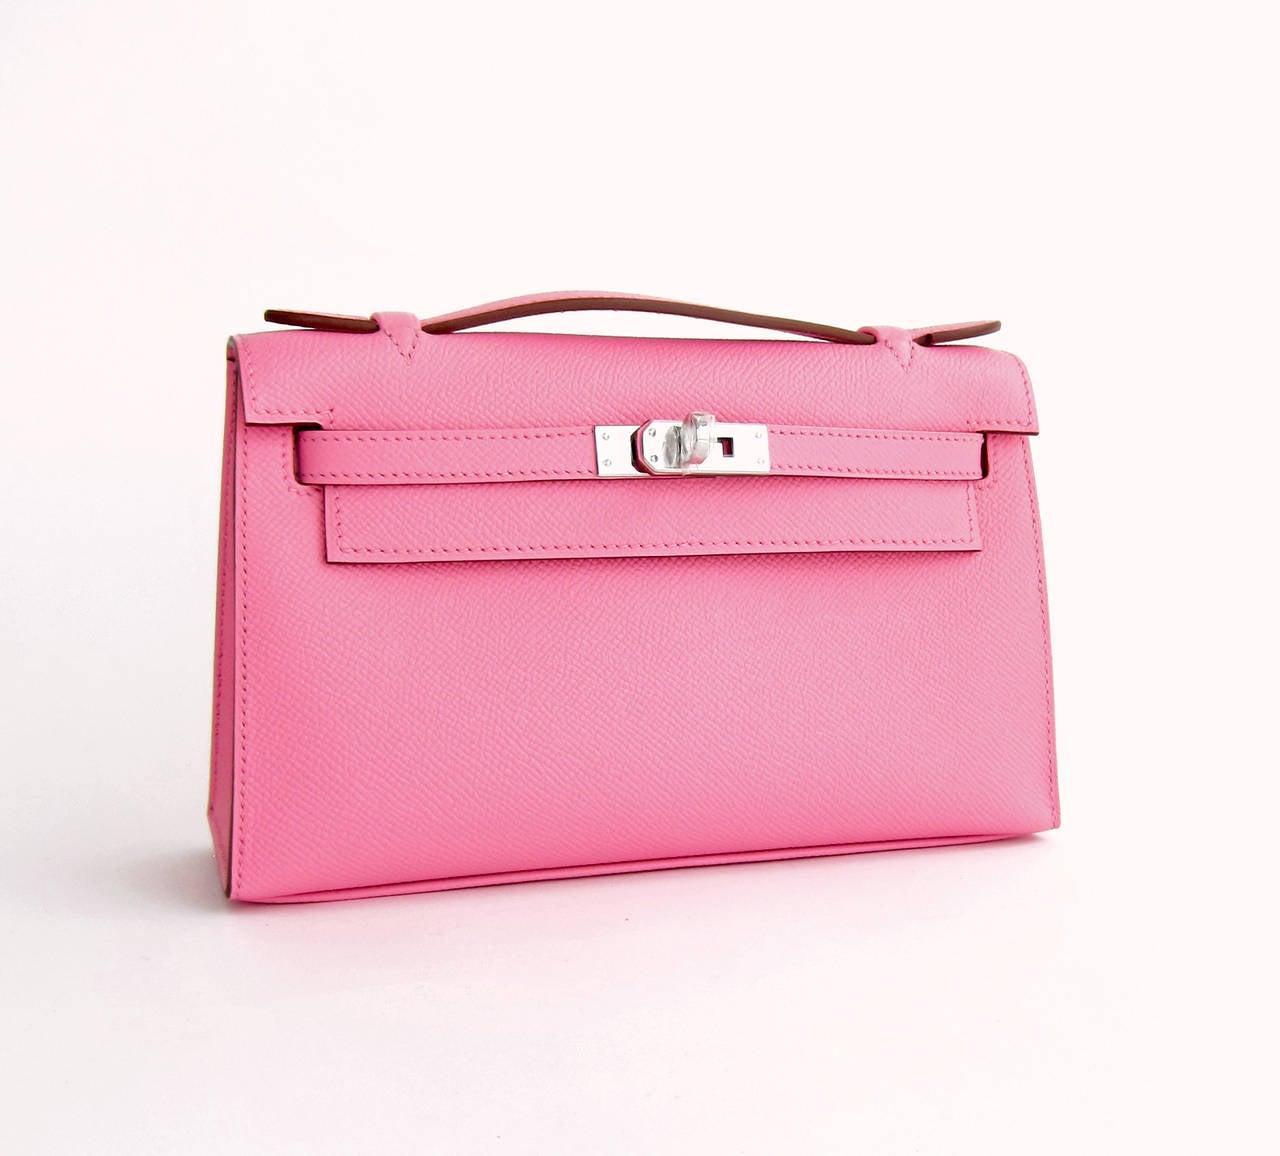 Hermes Rose Confetti Epsom Kelly Pochette Pink Clutch Bag Love 2